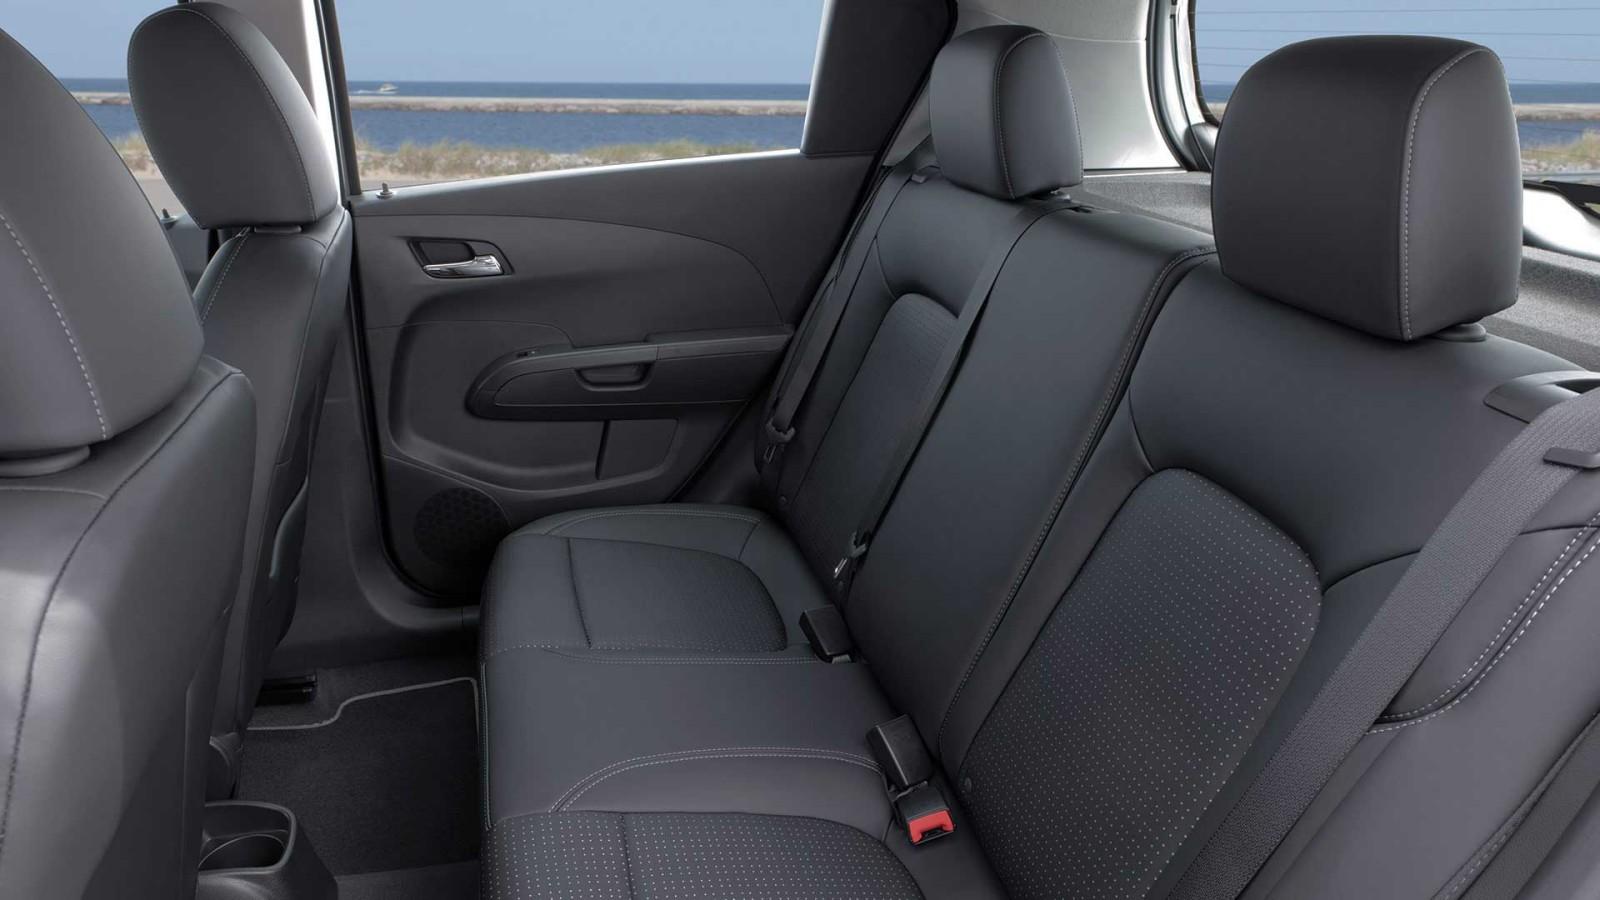 2016 Chevrolet Sonic interior passenger space